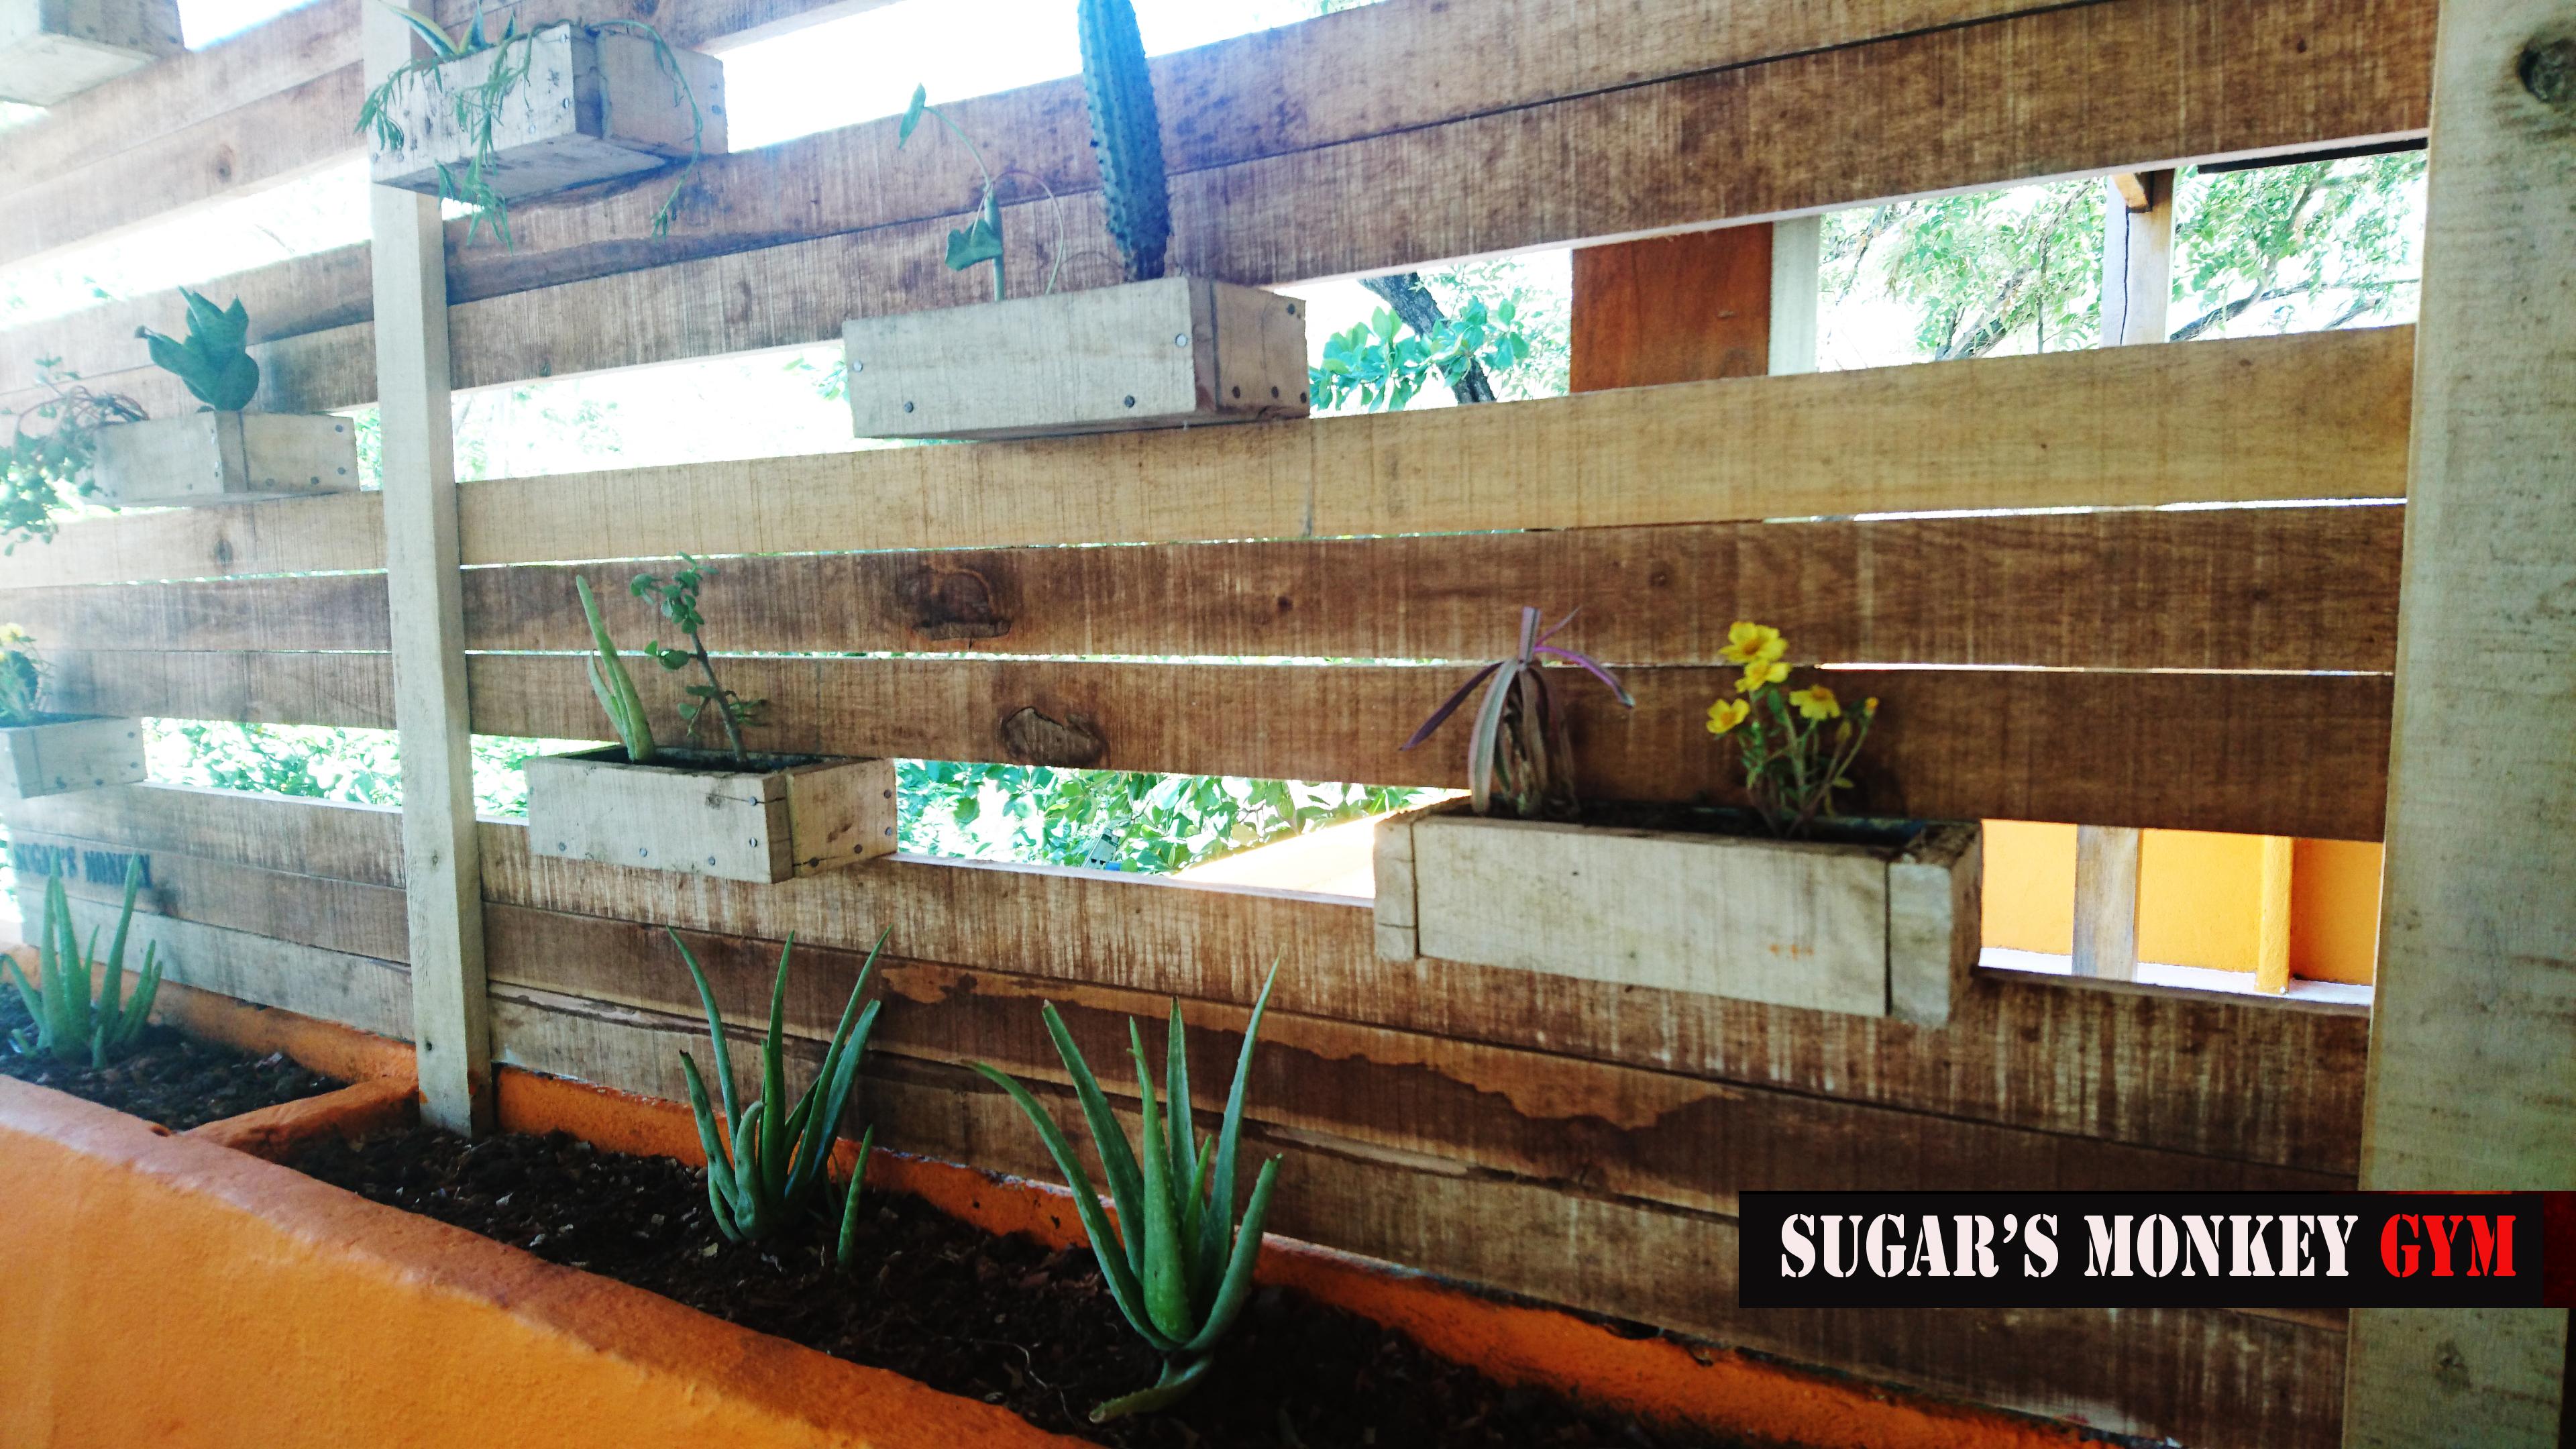 succulent_wall_gym_sugars_monkey_playa_grande_surf_poshtel_hotel_surf_school_trip_surfcamp_costa_ric